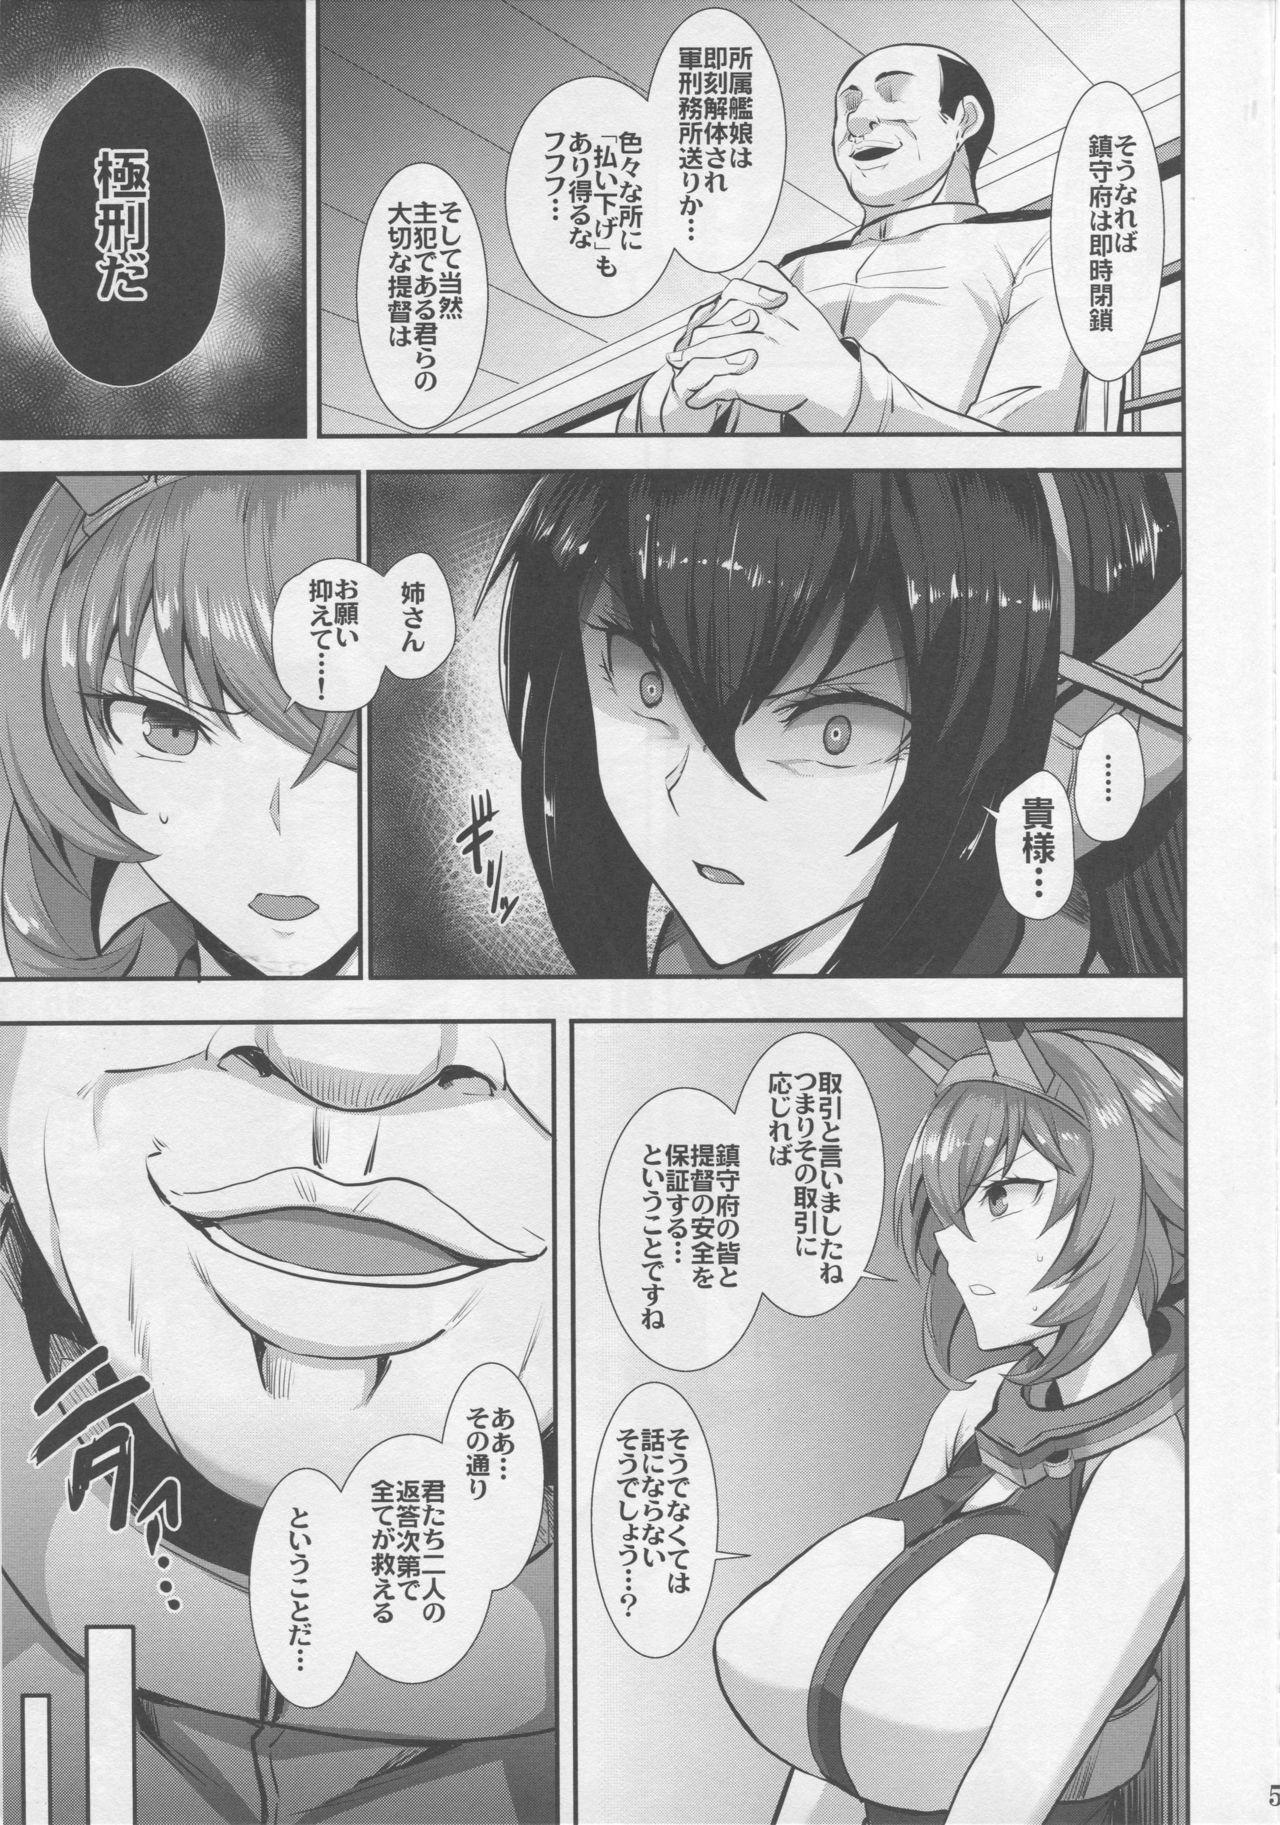 Ochiyuku Shimaikan 5